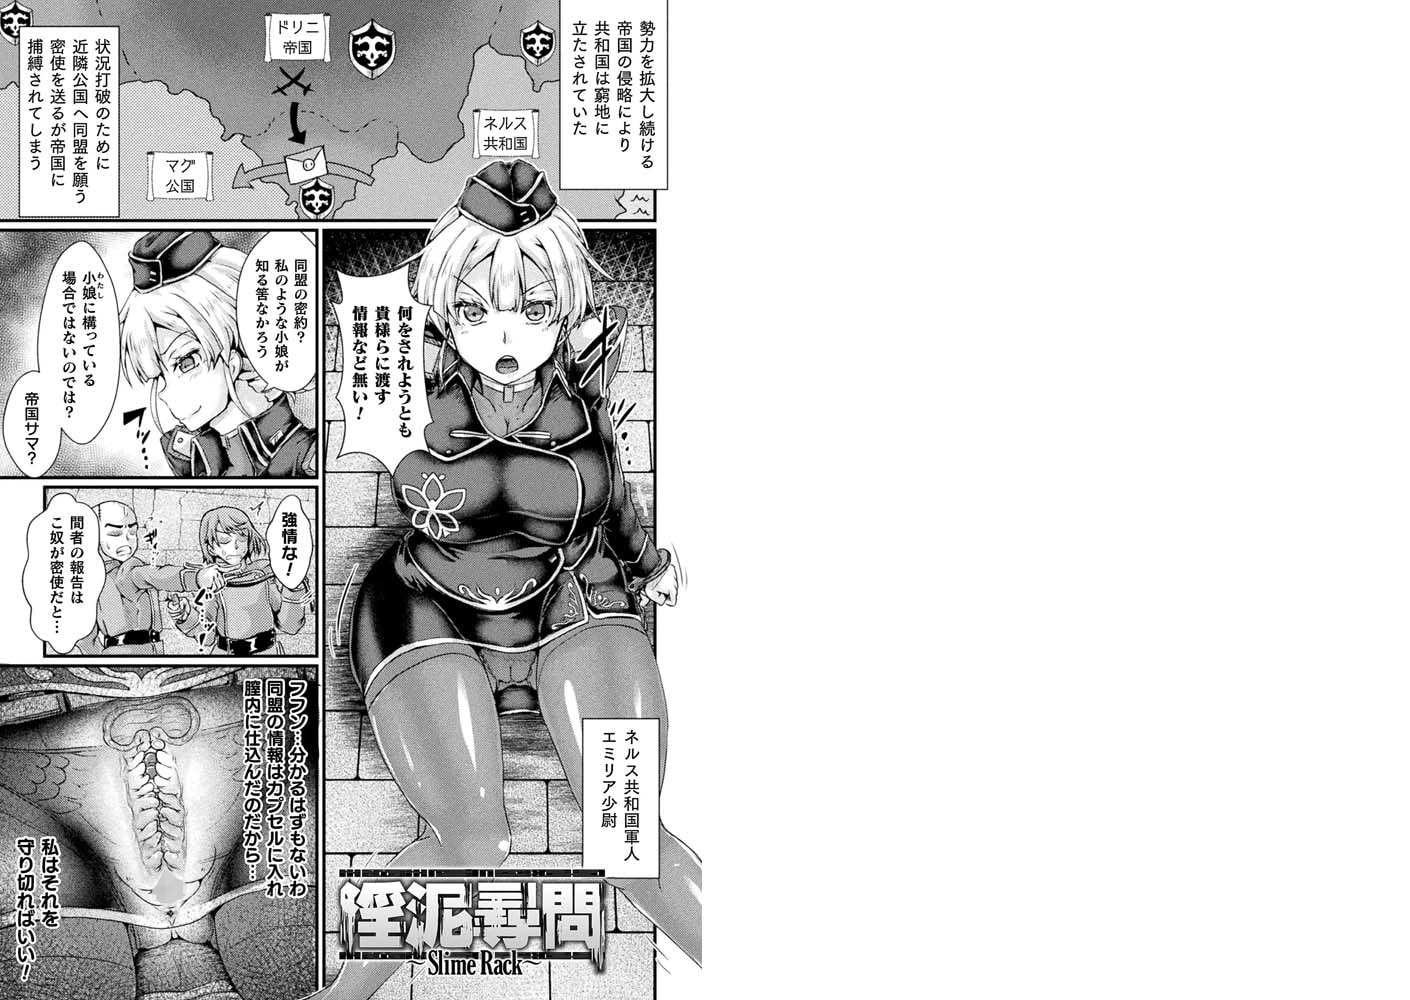 Corrupted Maiden ~淫欲に堕ちる戦姫たち~【電子書籍限定版】のサンプル画像